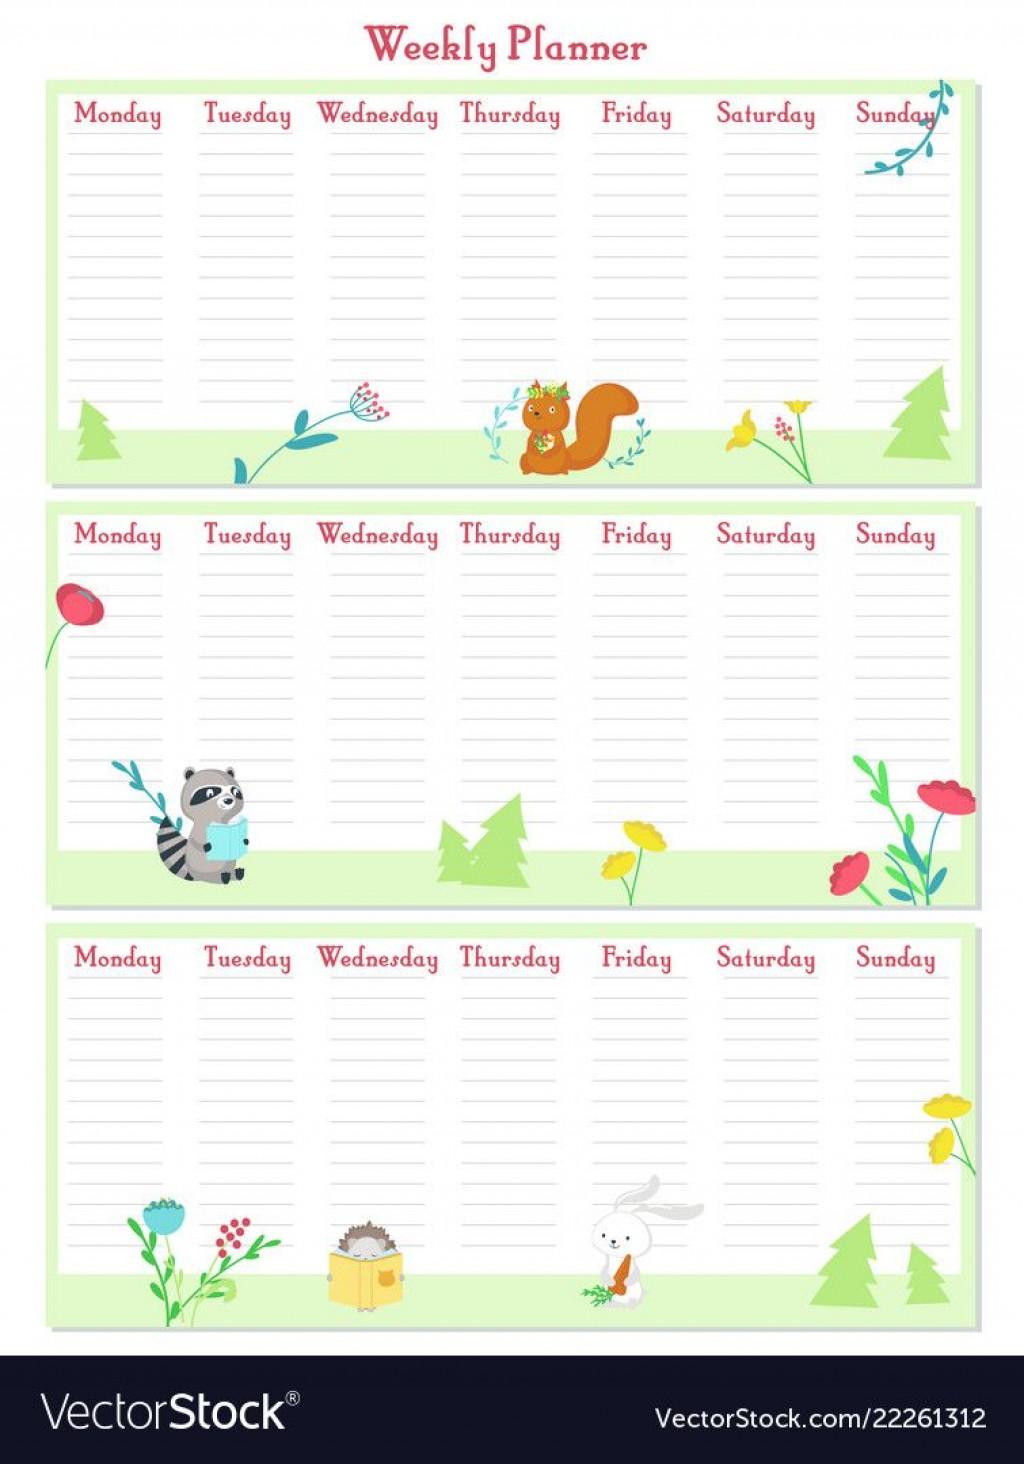 009 Incredible Printable Weekly Planner Template Cute Highest Clarity  Free CalendarLarge